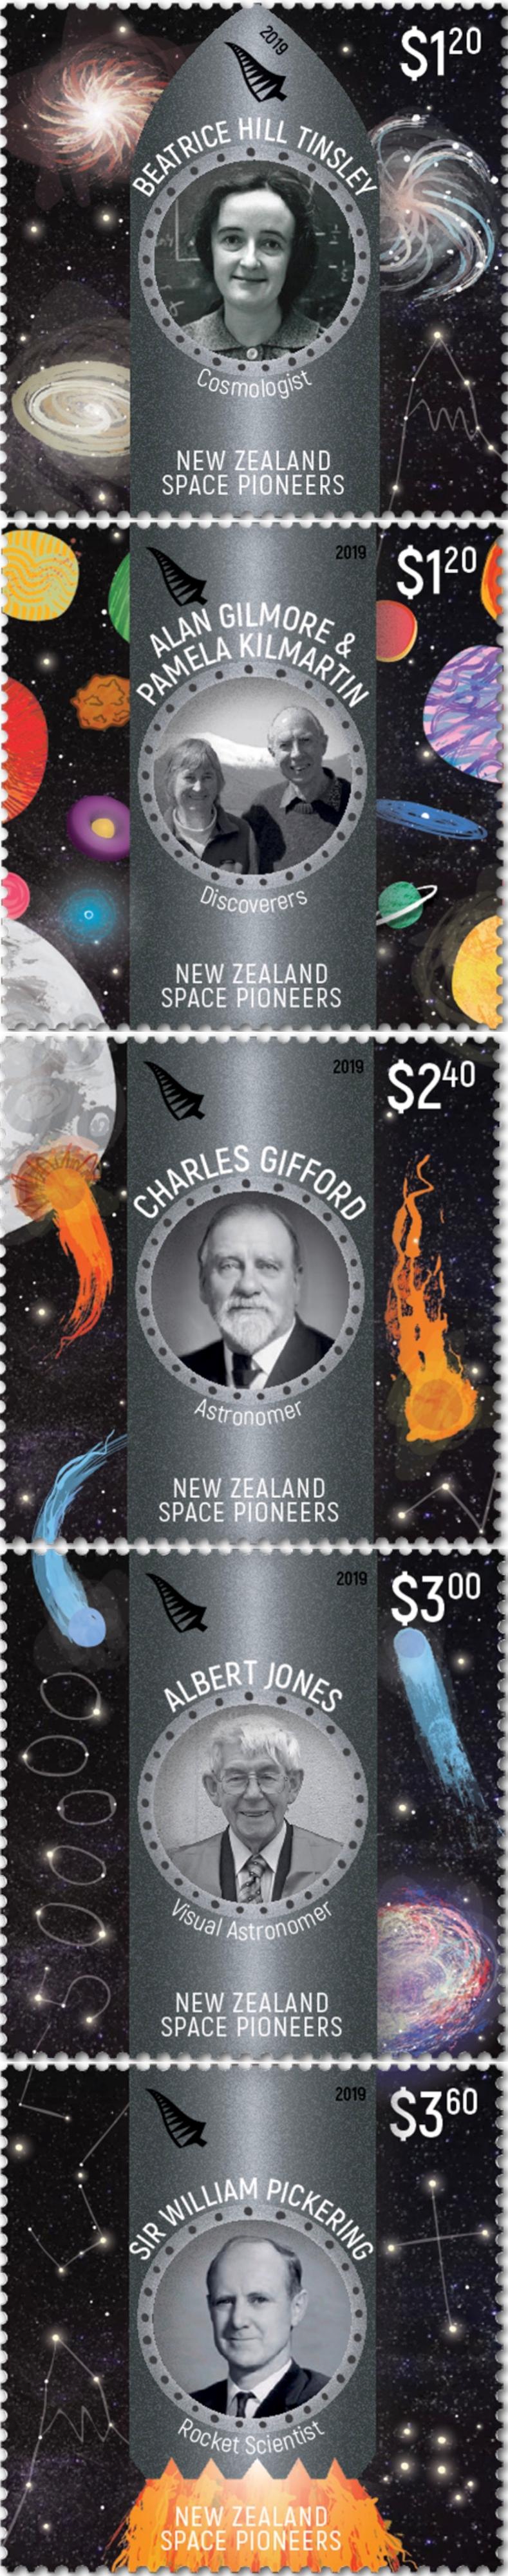 New Zealand - Space Pioneers (May 1, 2019) se-tenant strip of 5